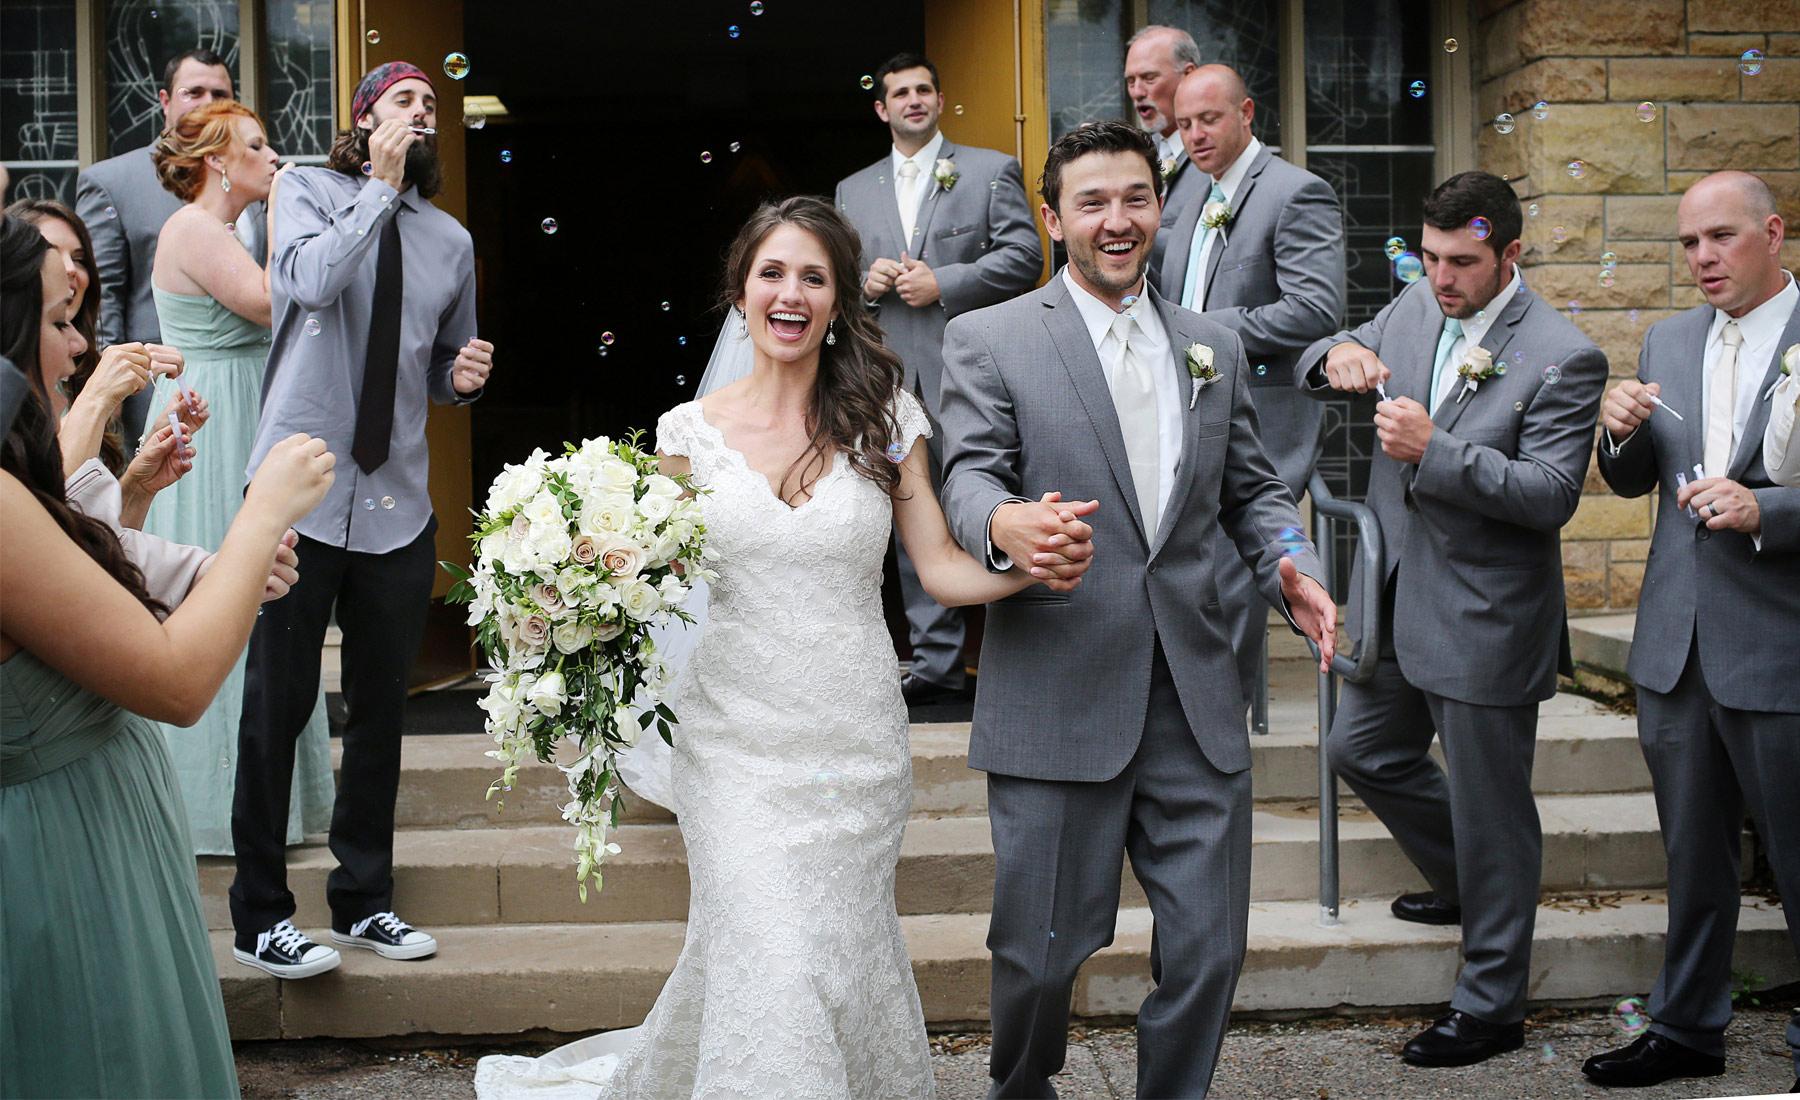 08-Stillwater-Minnesota-Wedding-Photography-by-Vick-Photography--St-Patricks-Church-Ceremony-Bubbles-Alicia-&-Cole.jpg